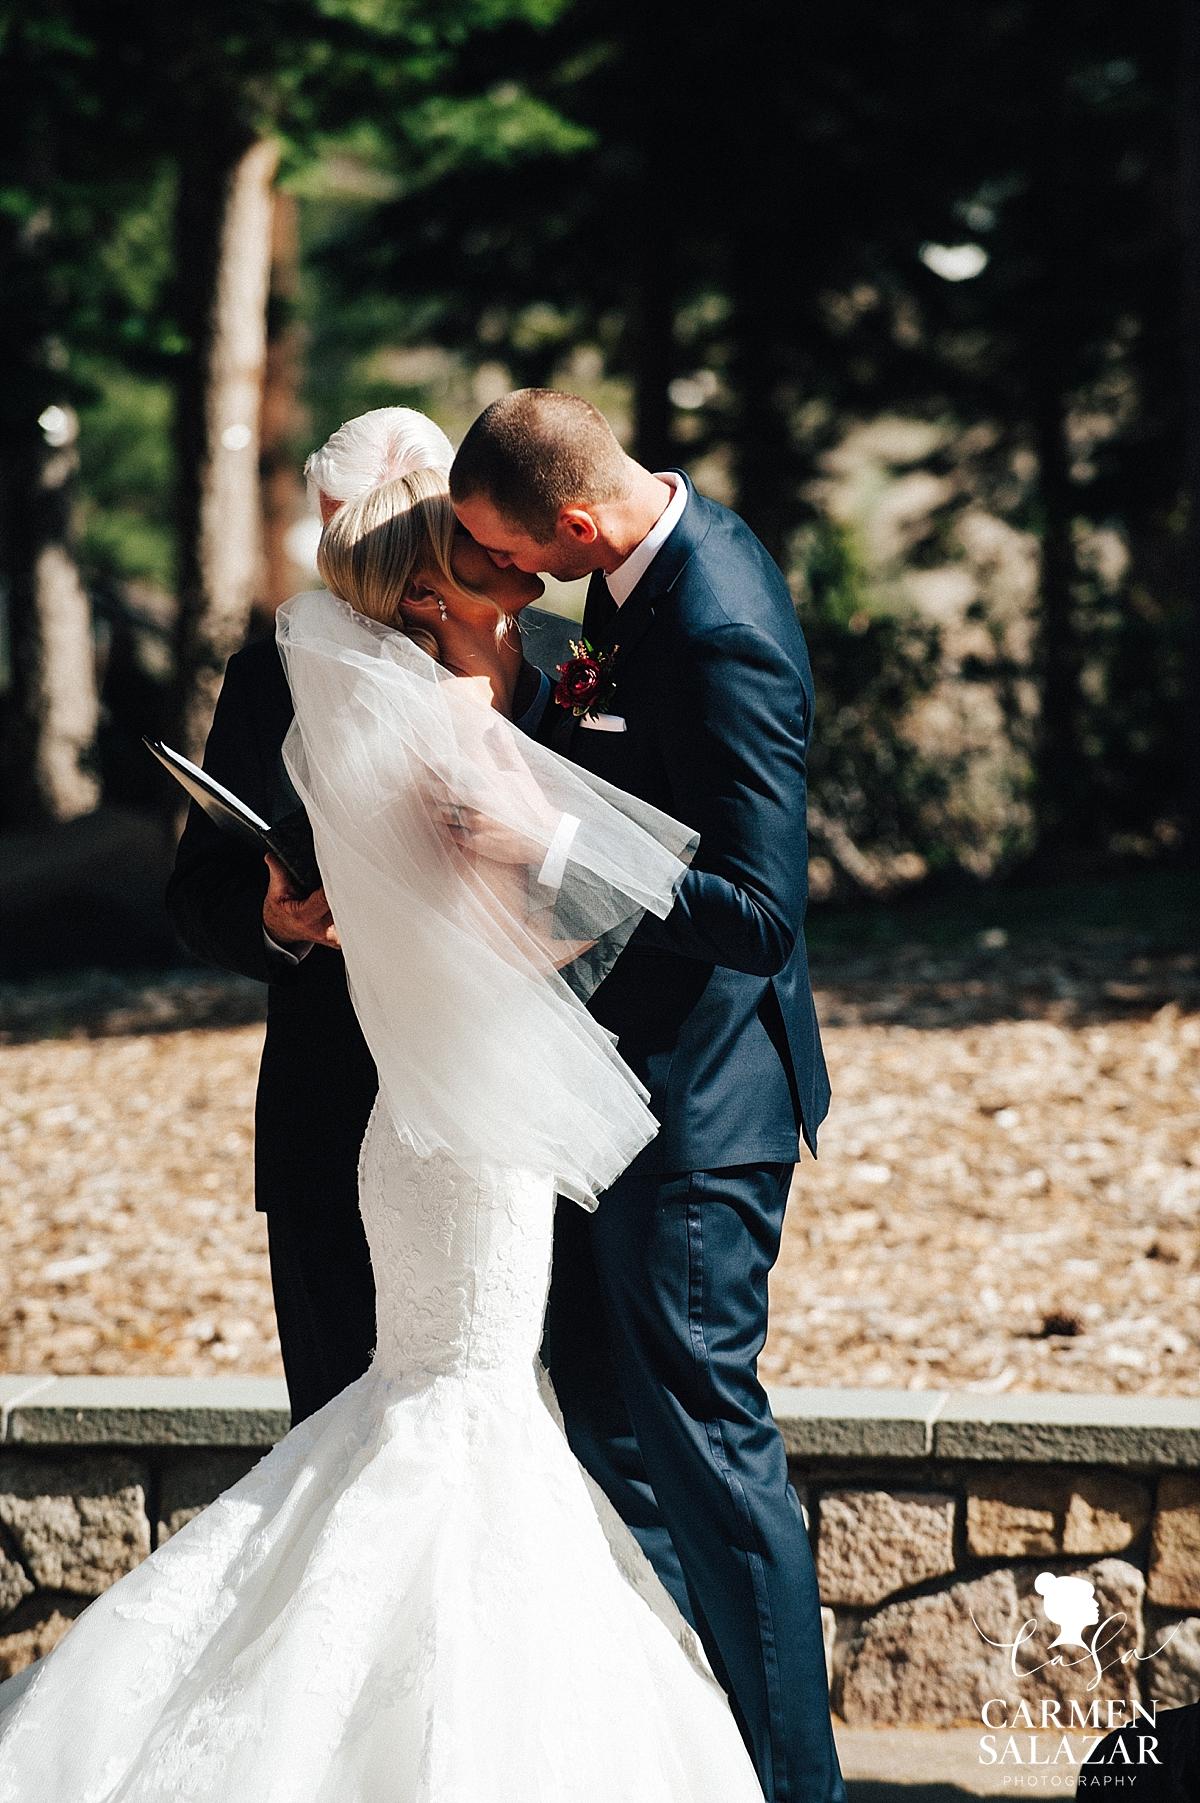 Romantic Tahoe wedding ceremony - Carmen Salazar